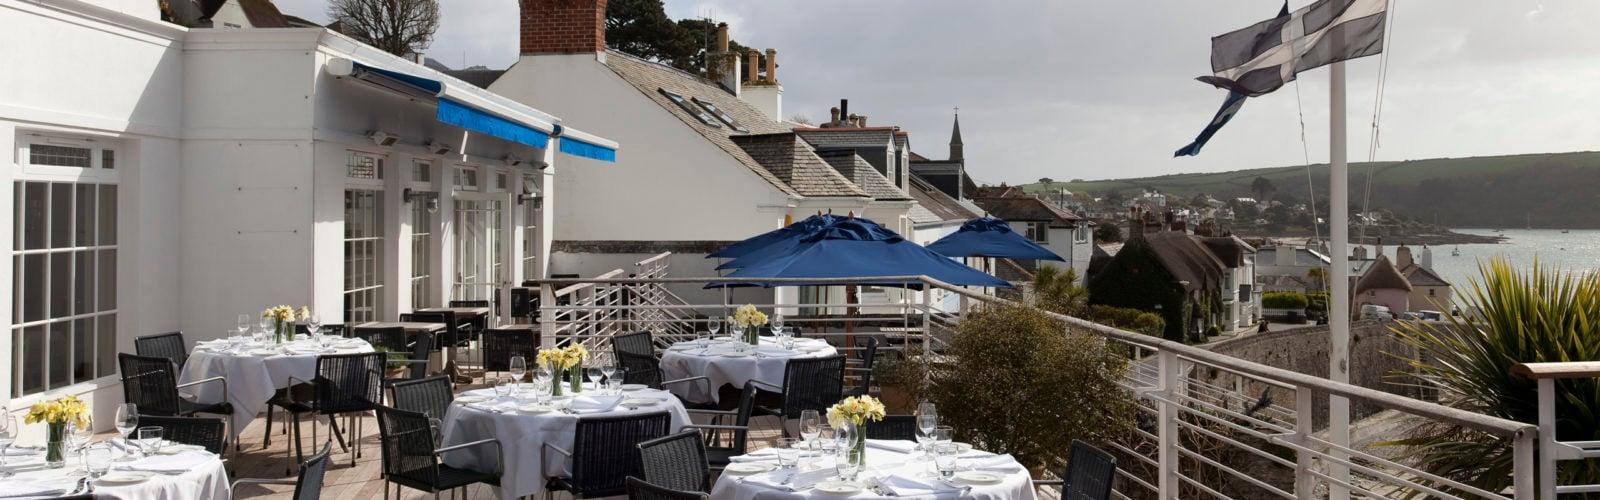 tresanton-hotel-restaurant-terrace